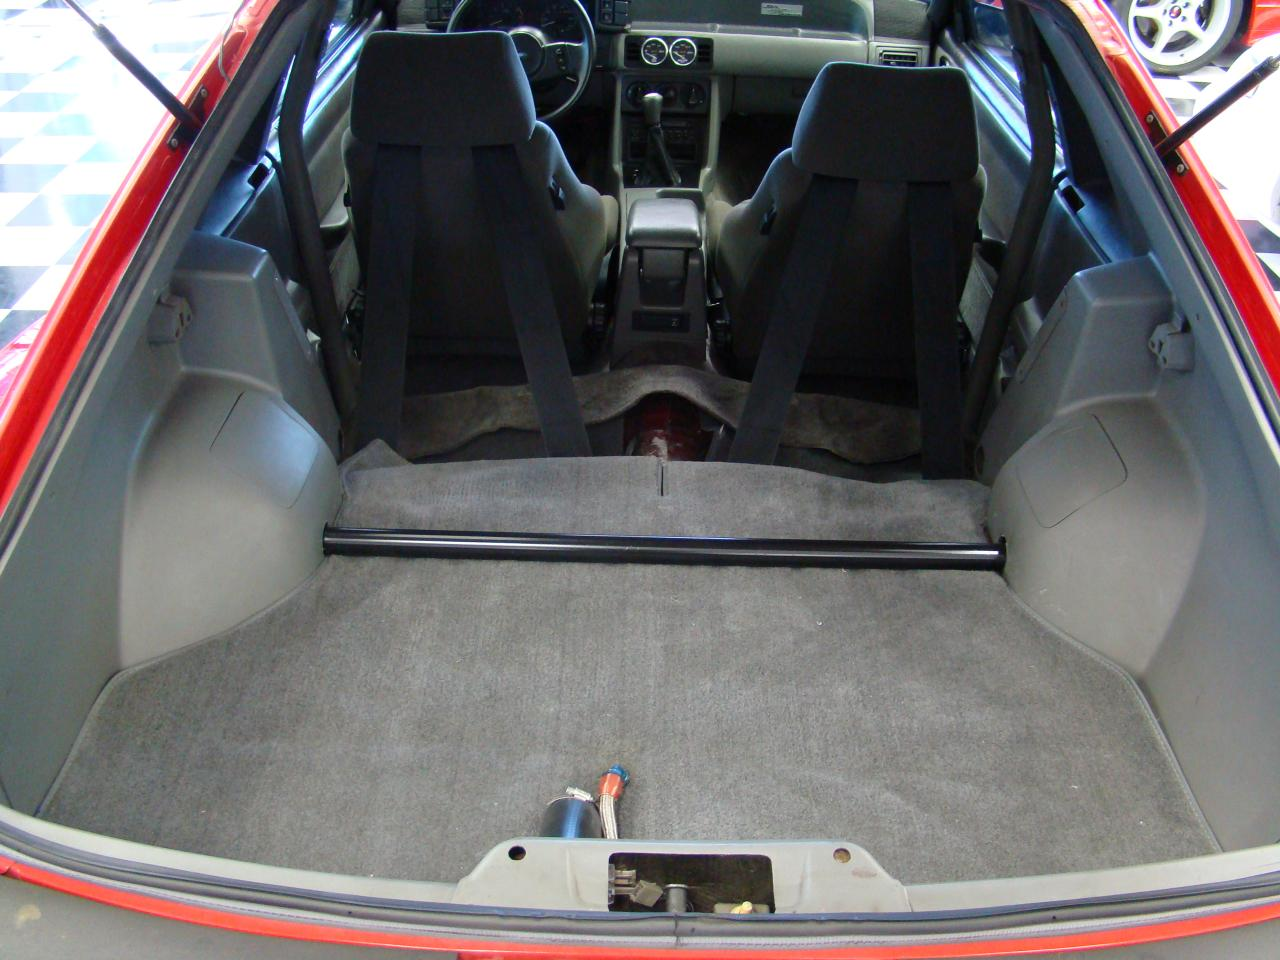 JBA Team Dominator GTA Trunk and Rear Strut tower Brace